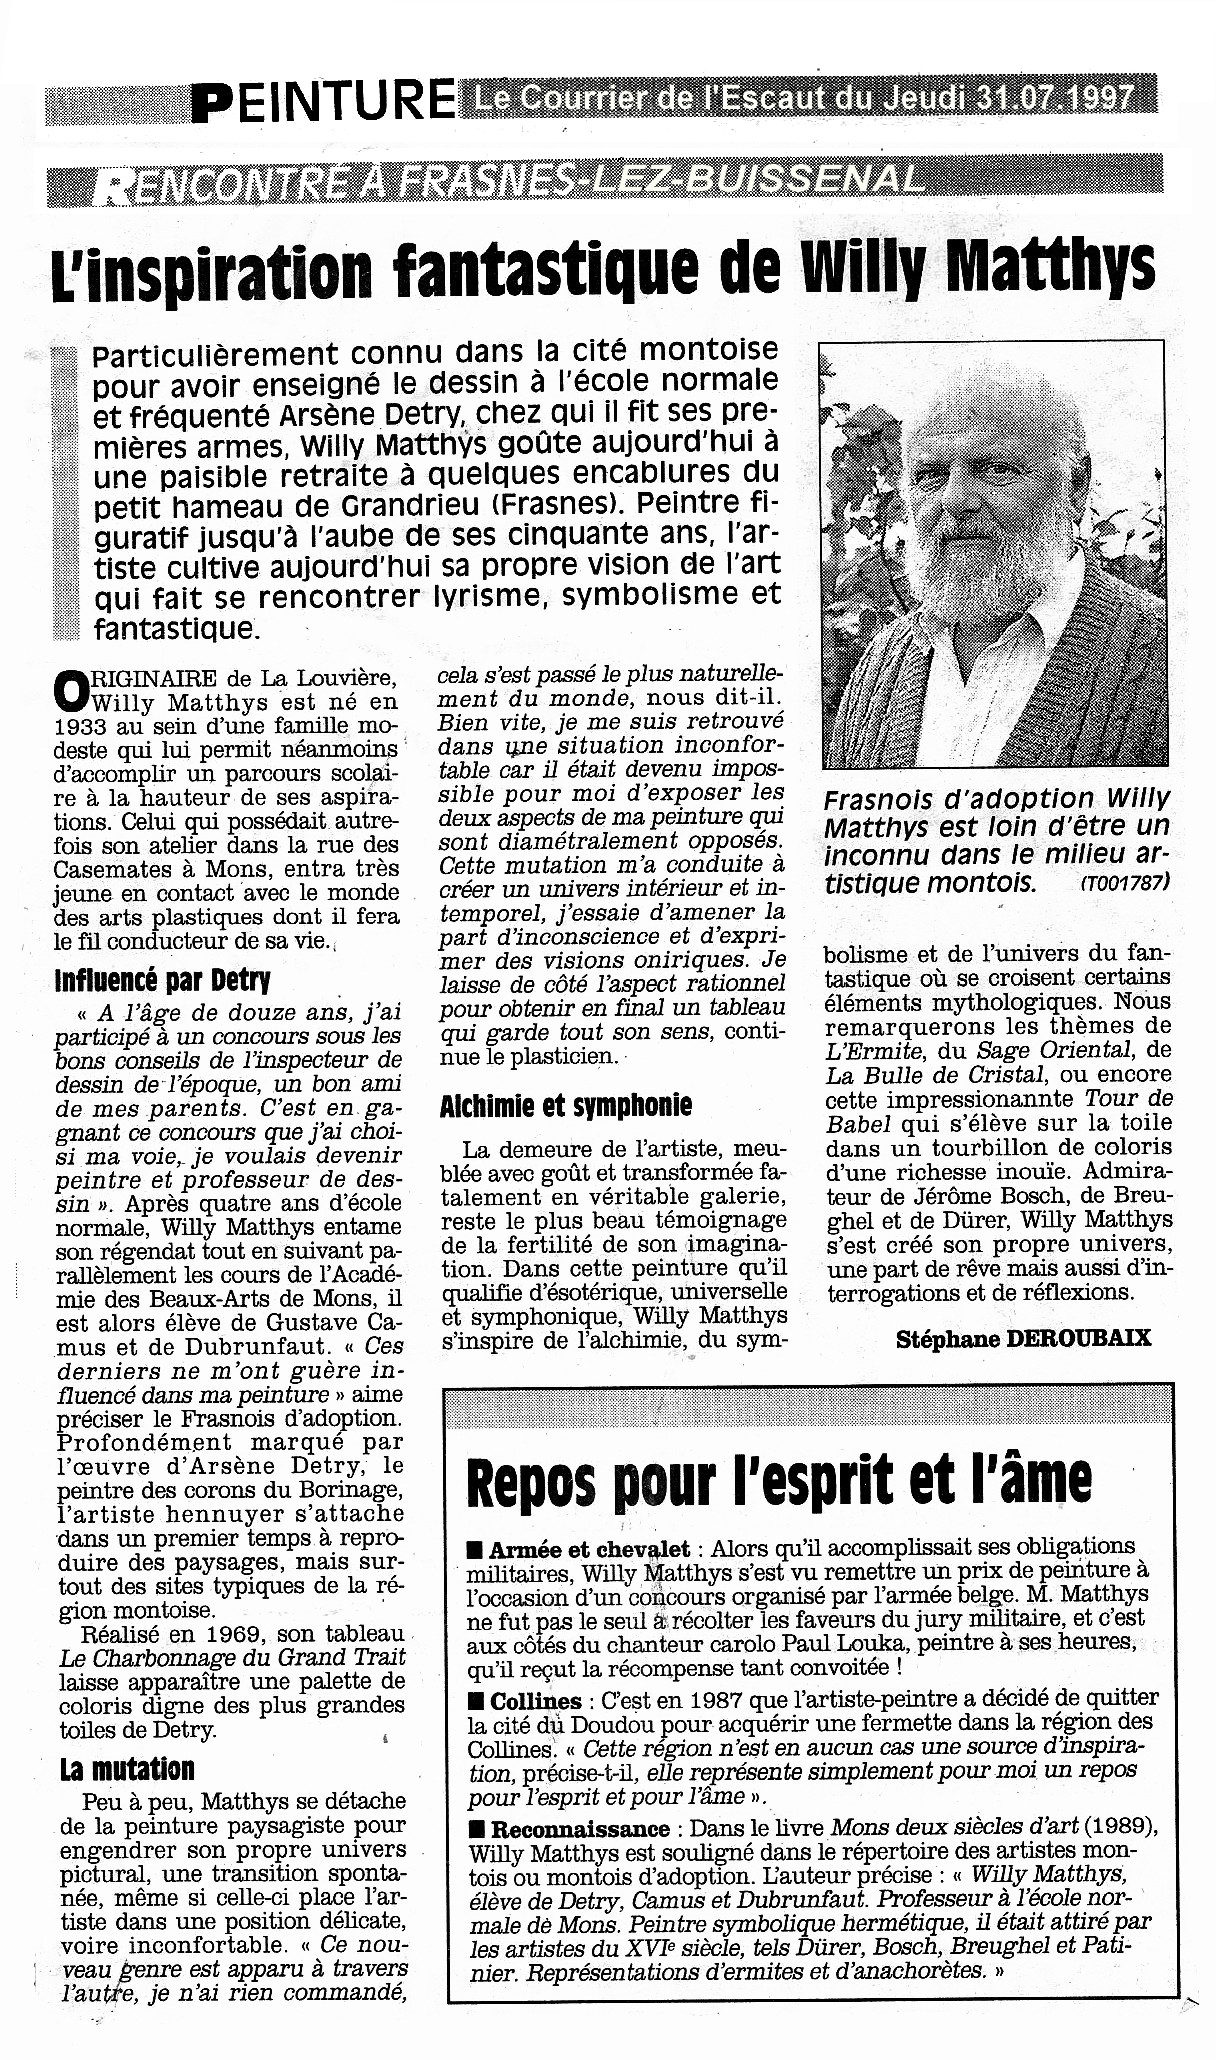 Matthys Willy 31.07.1997